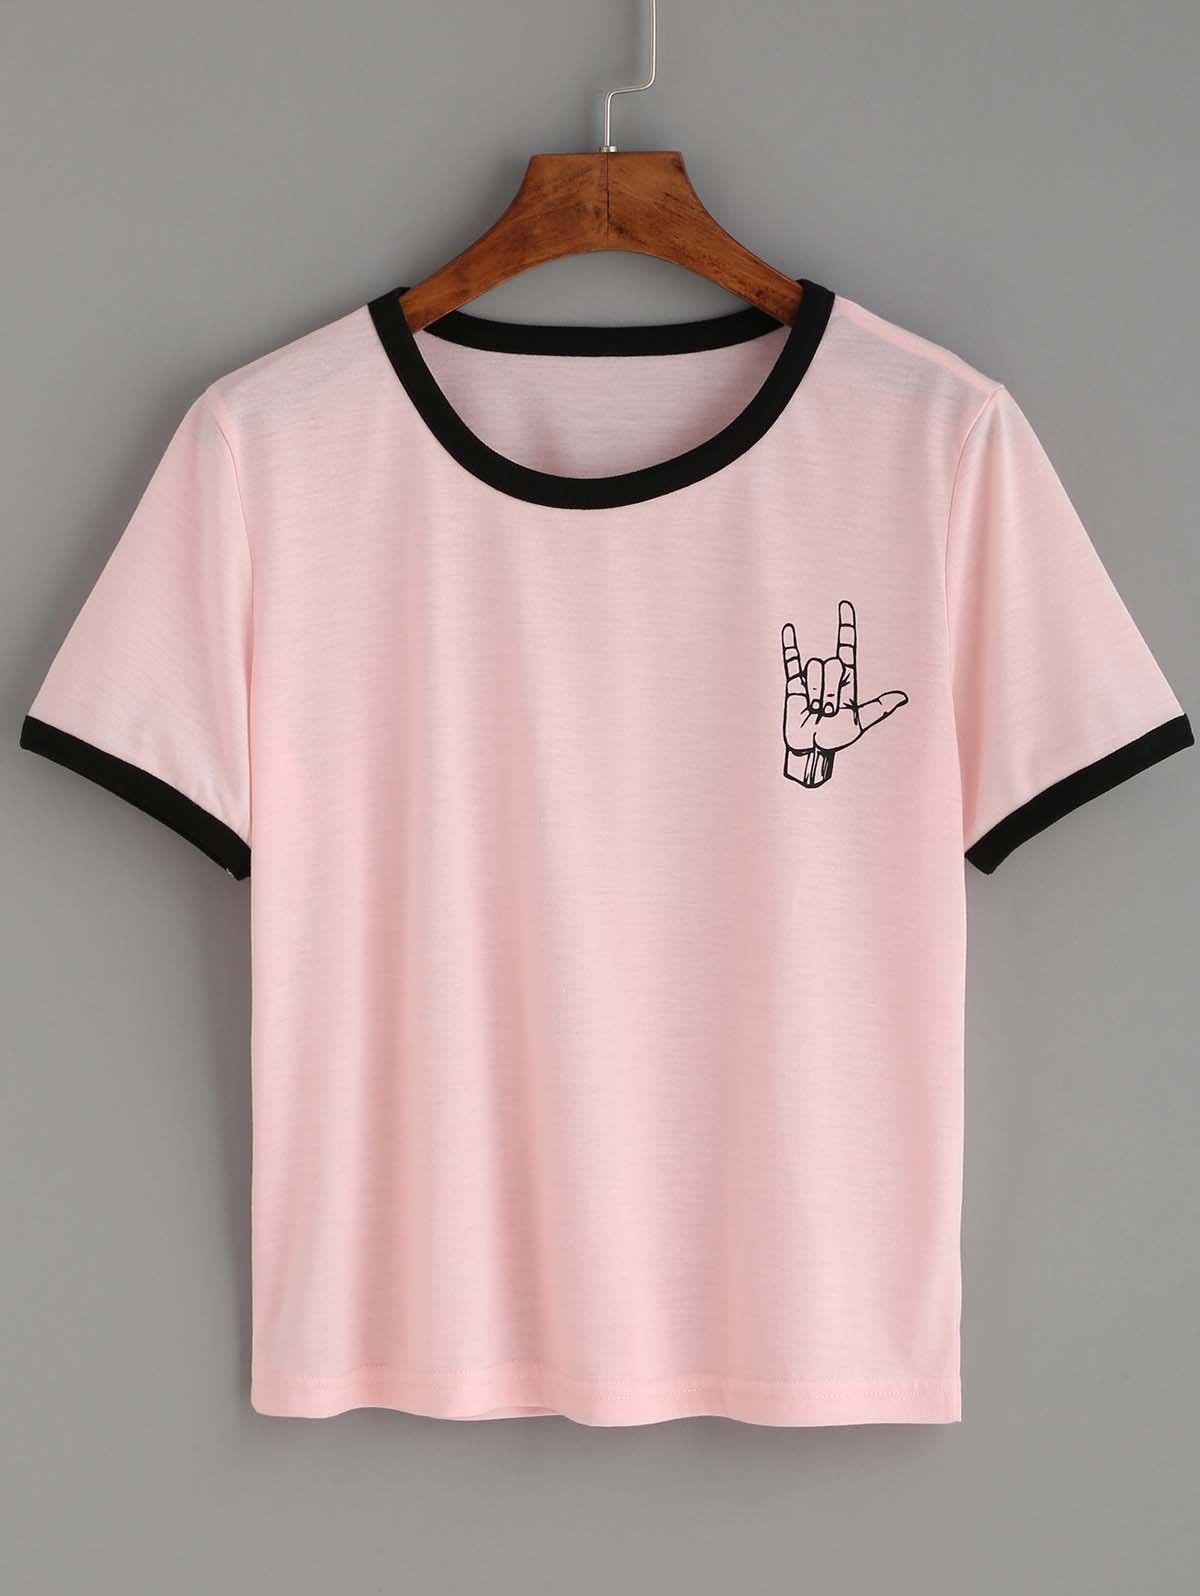 elegante Schuhe Großhandelsverkauf Kauf echt t shirt feminina rosa Hit na moda Gesto | t shirt feminina ...